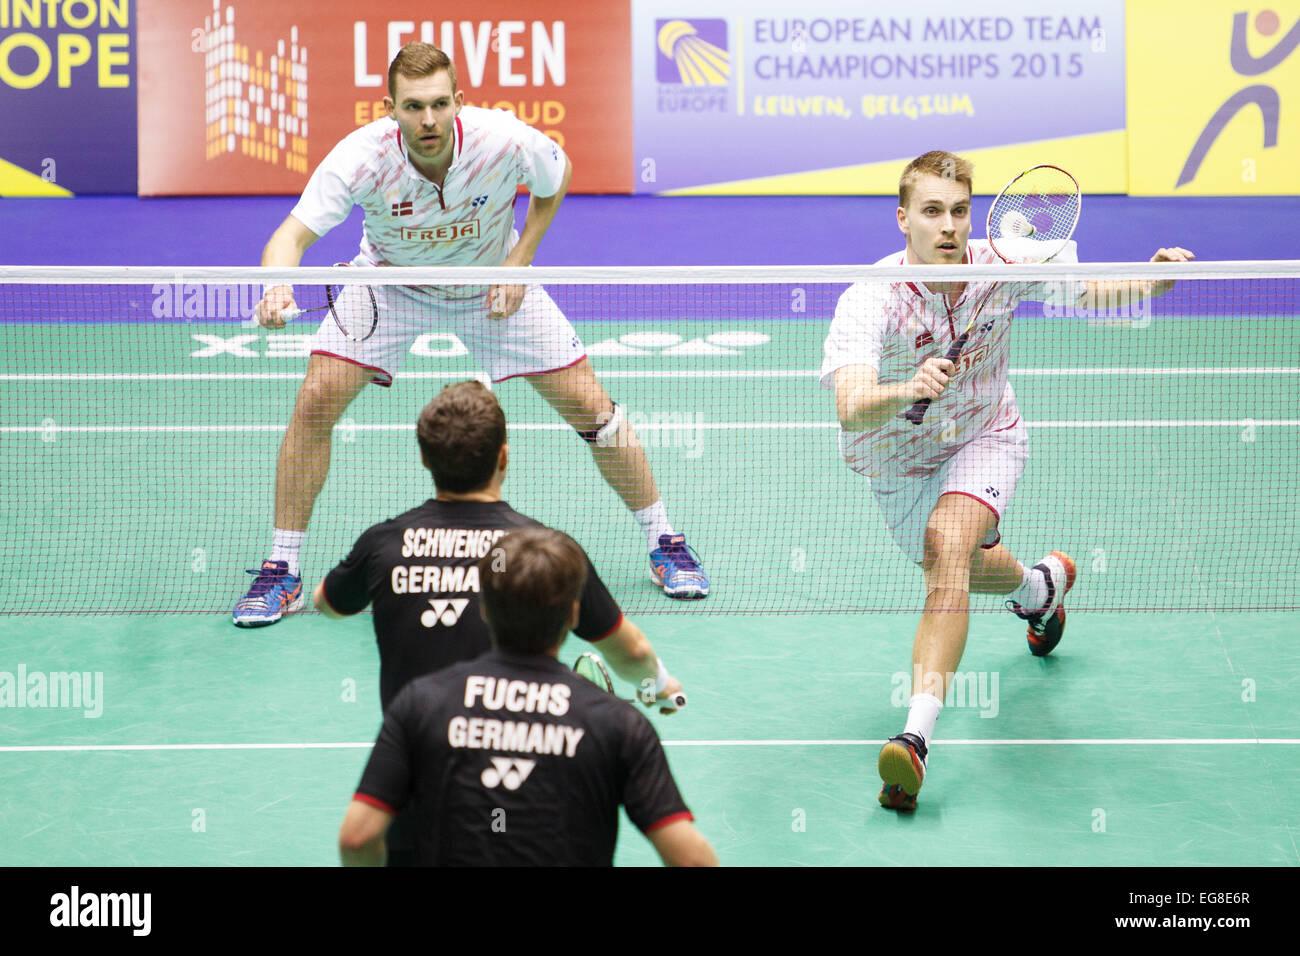 LEUVEN BELGIUM 14 02 2015 Badminton players Mads Conrad